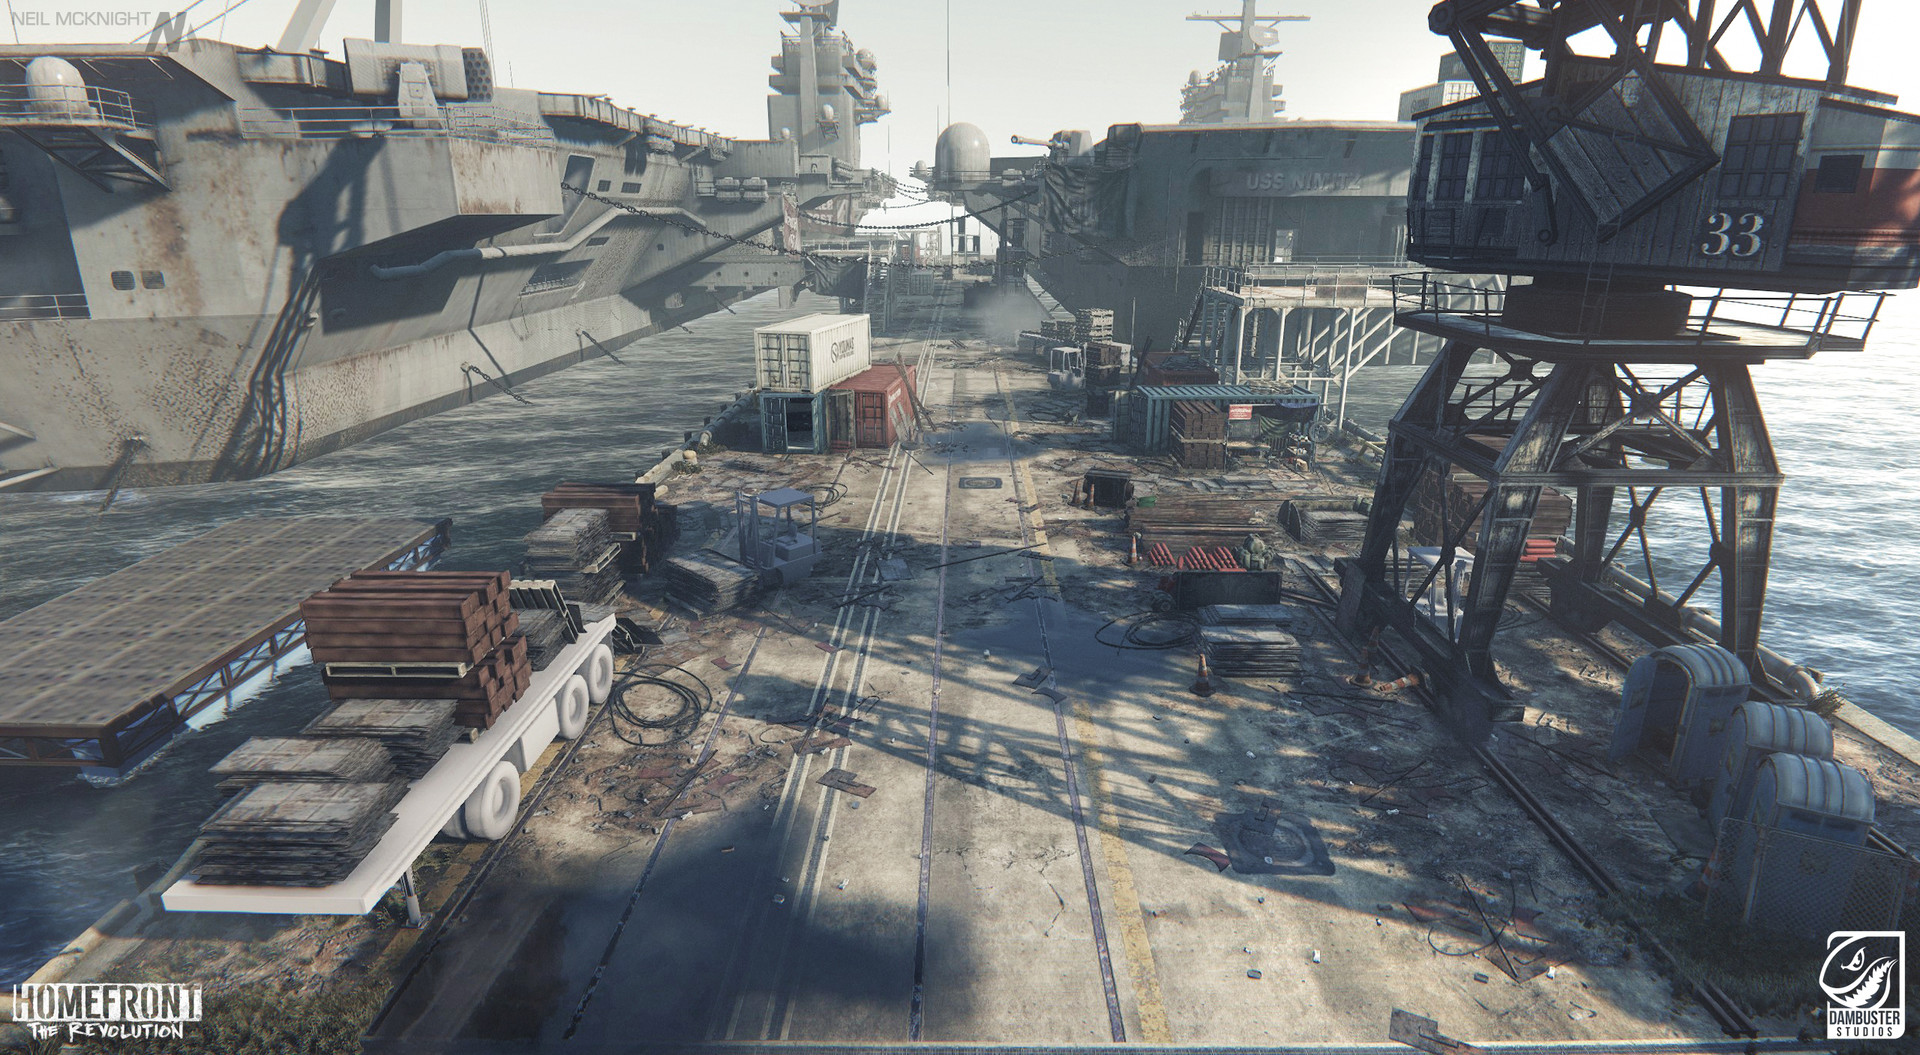 ArtStation - Homefront the Revolution: Philadelphia Navy